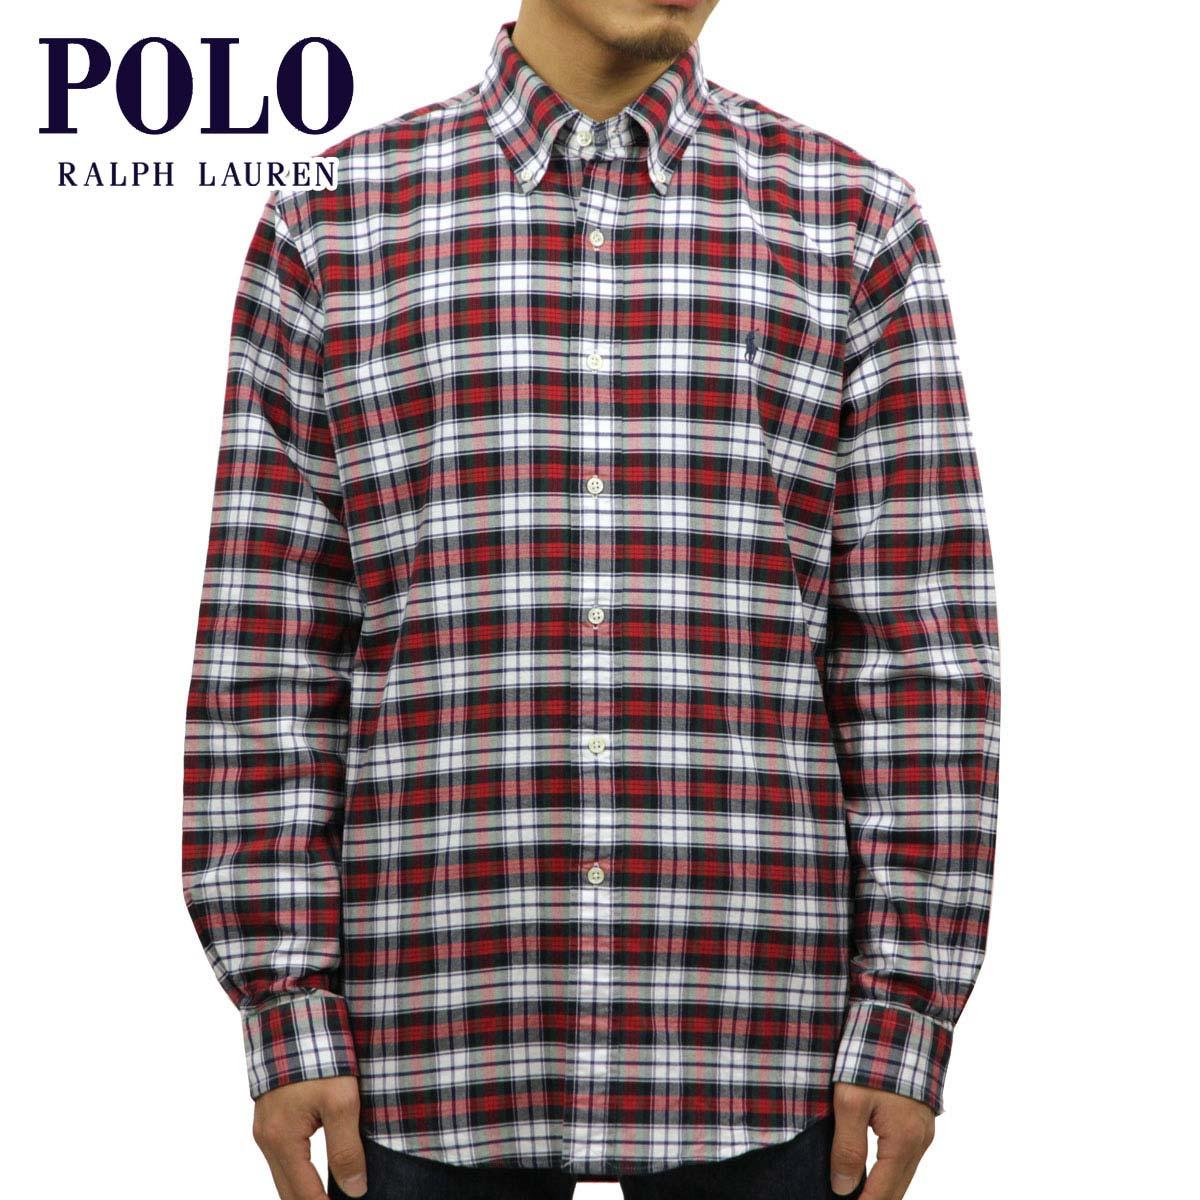 40%OFFセール 【販売期間 12/19 20:00~12/26 01:59】 ポロ ラルフローレン シャツ メンズ 正規品 POLO RALPH LAUREN 長袖シャツ Custom-Fit Plaid Oxford Checked Shirt